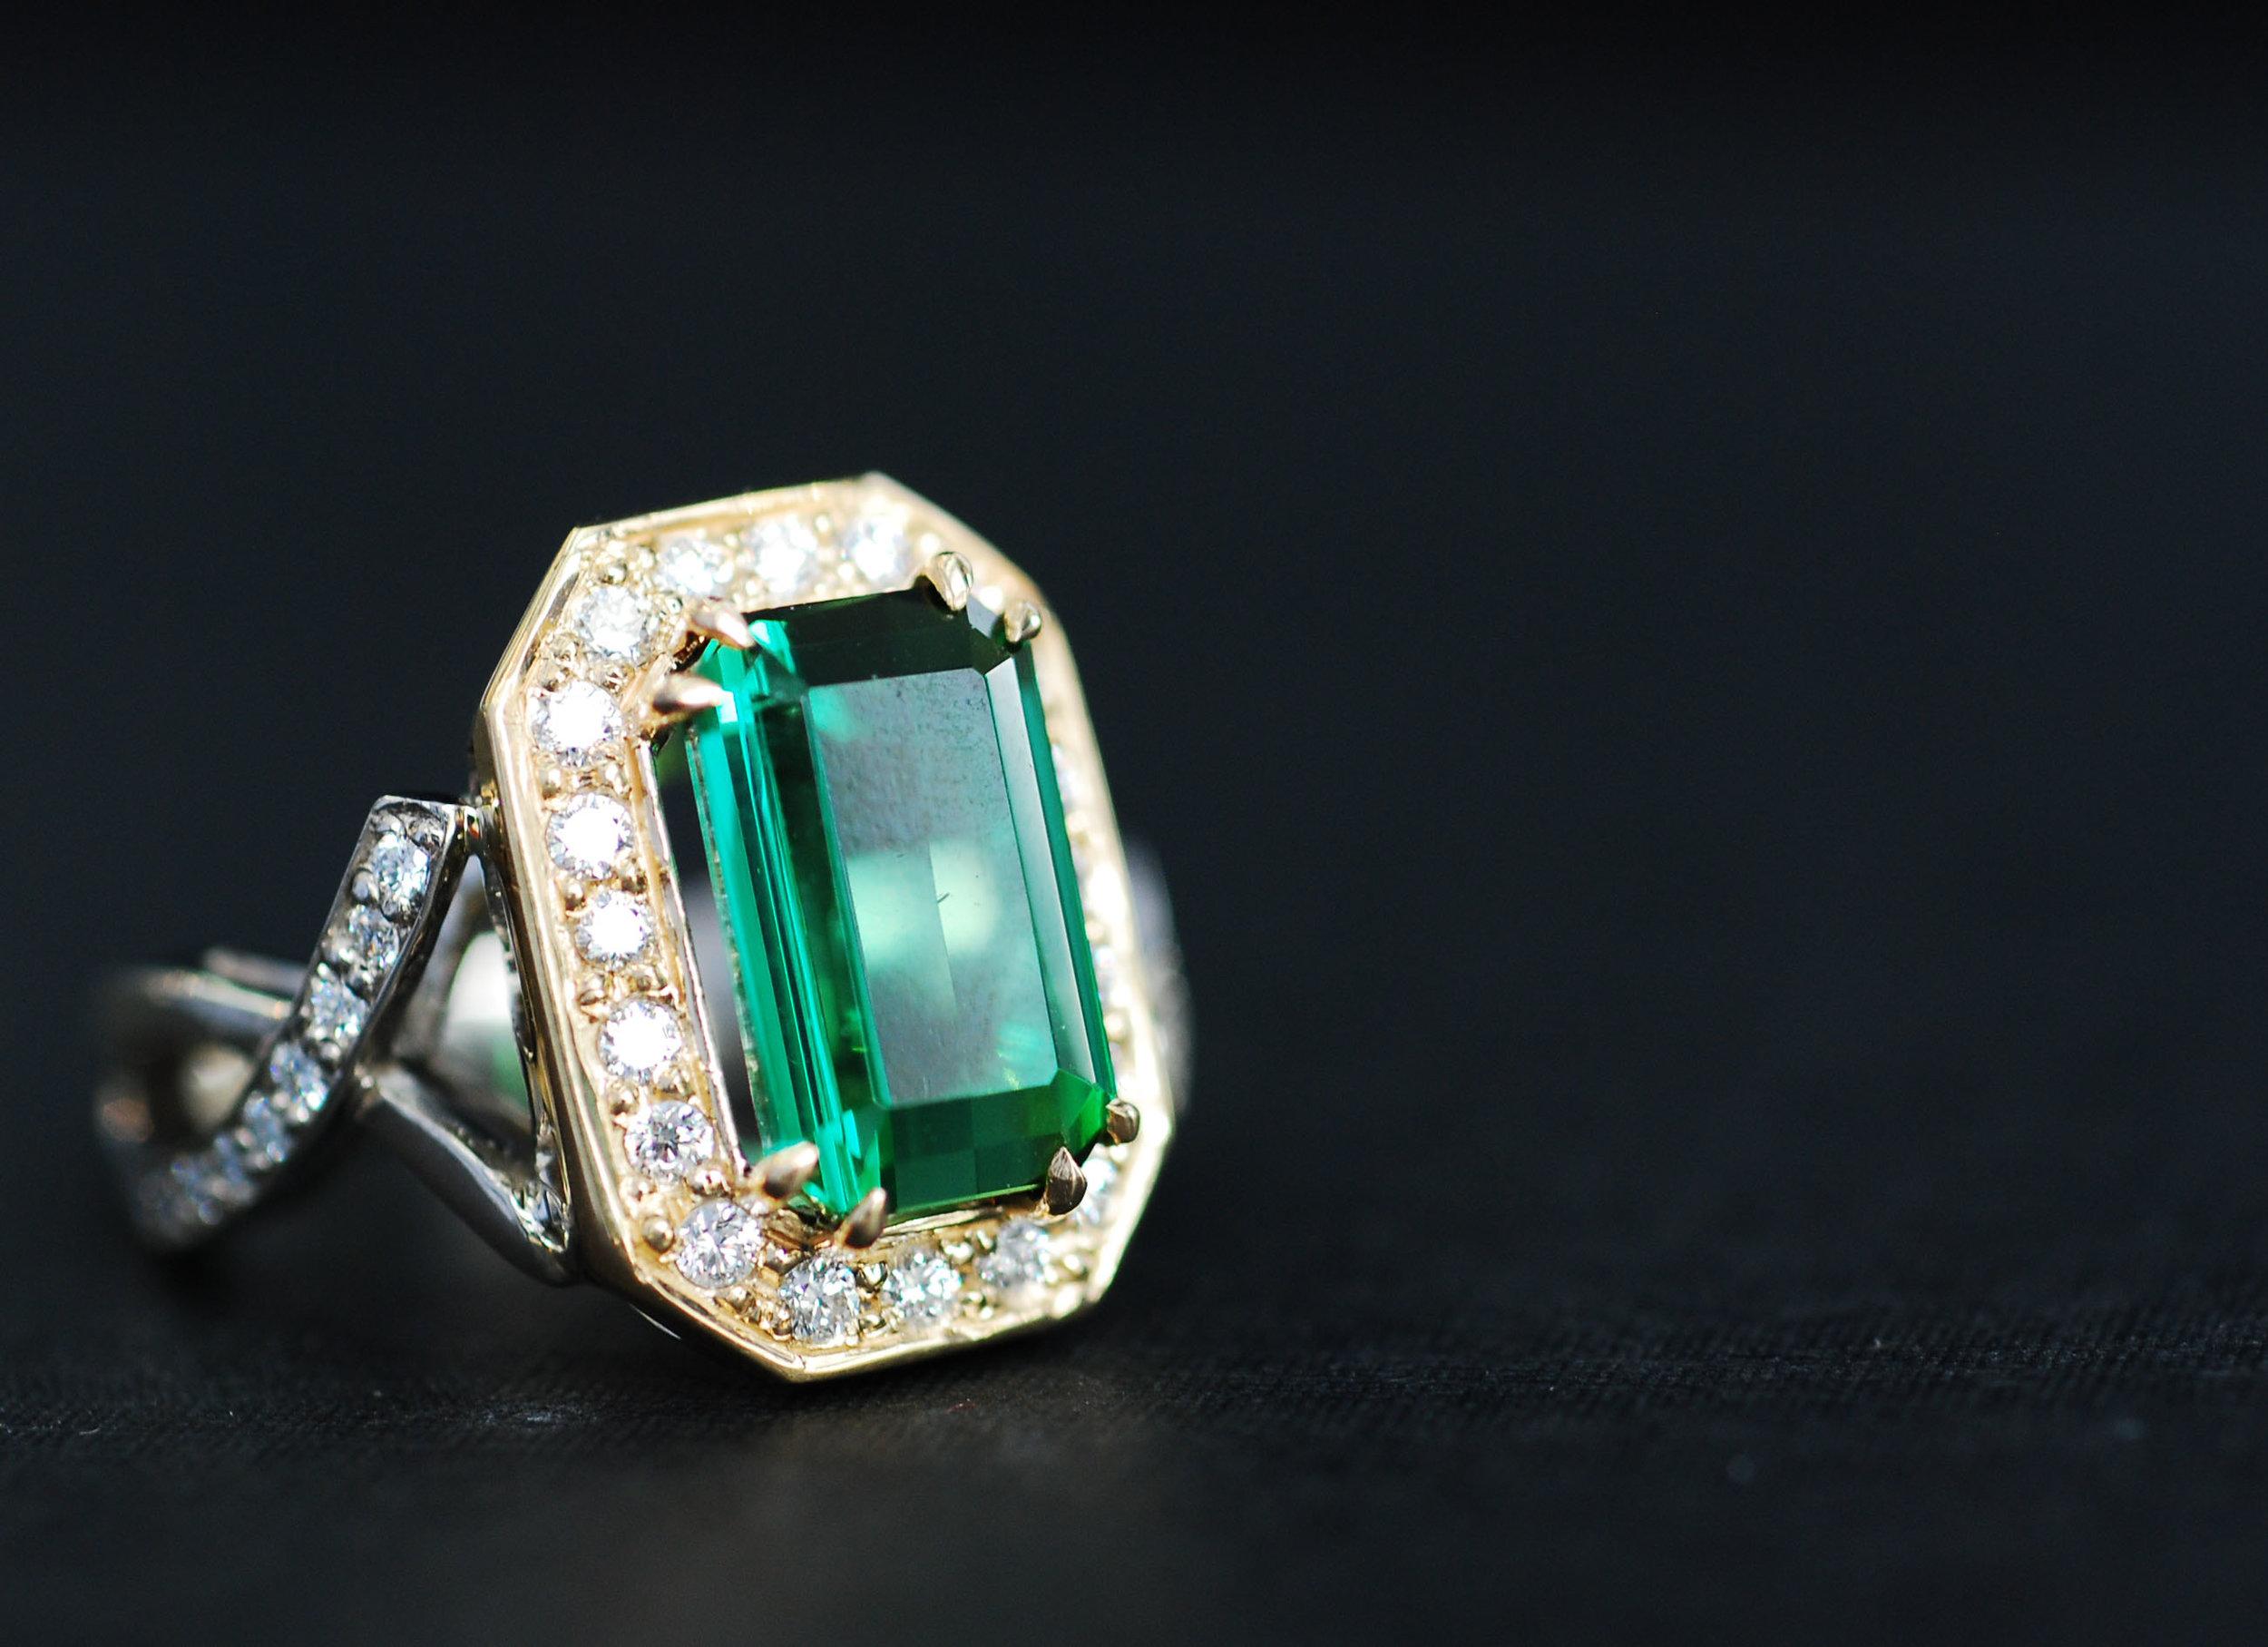 Two-Tone Green Tourmaline Ring